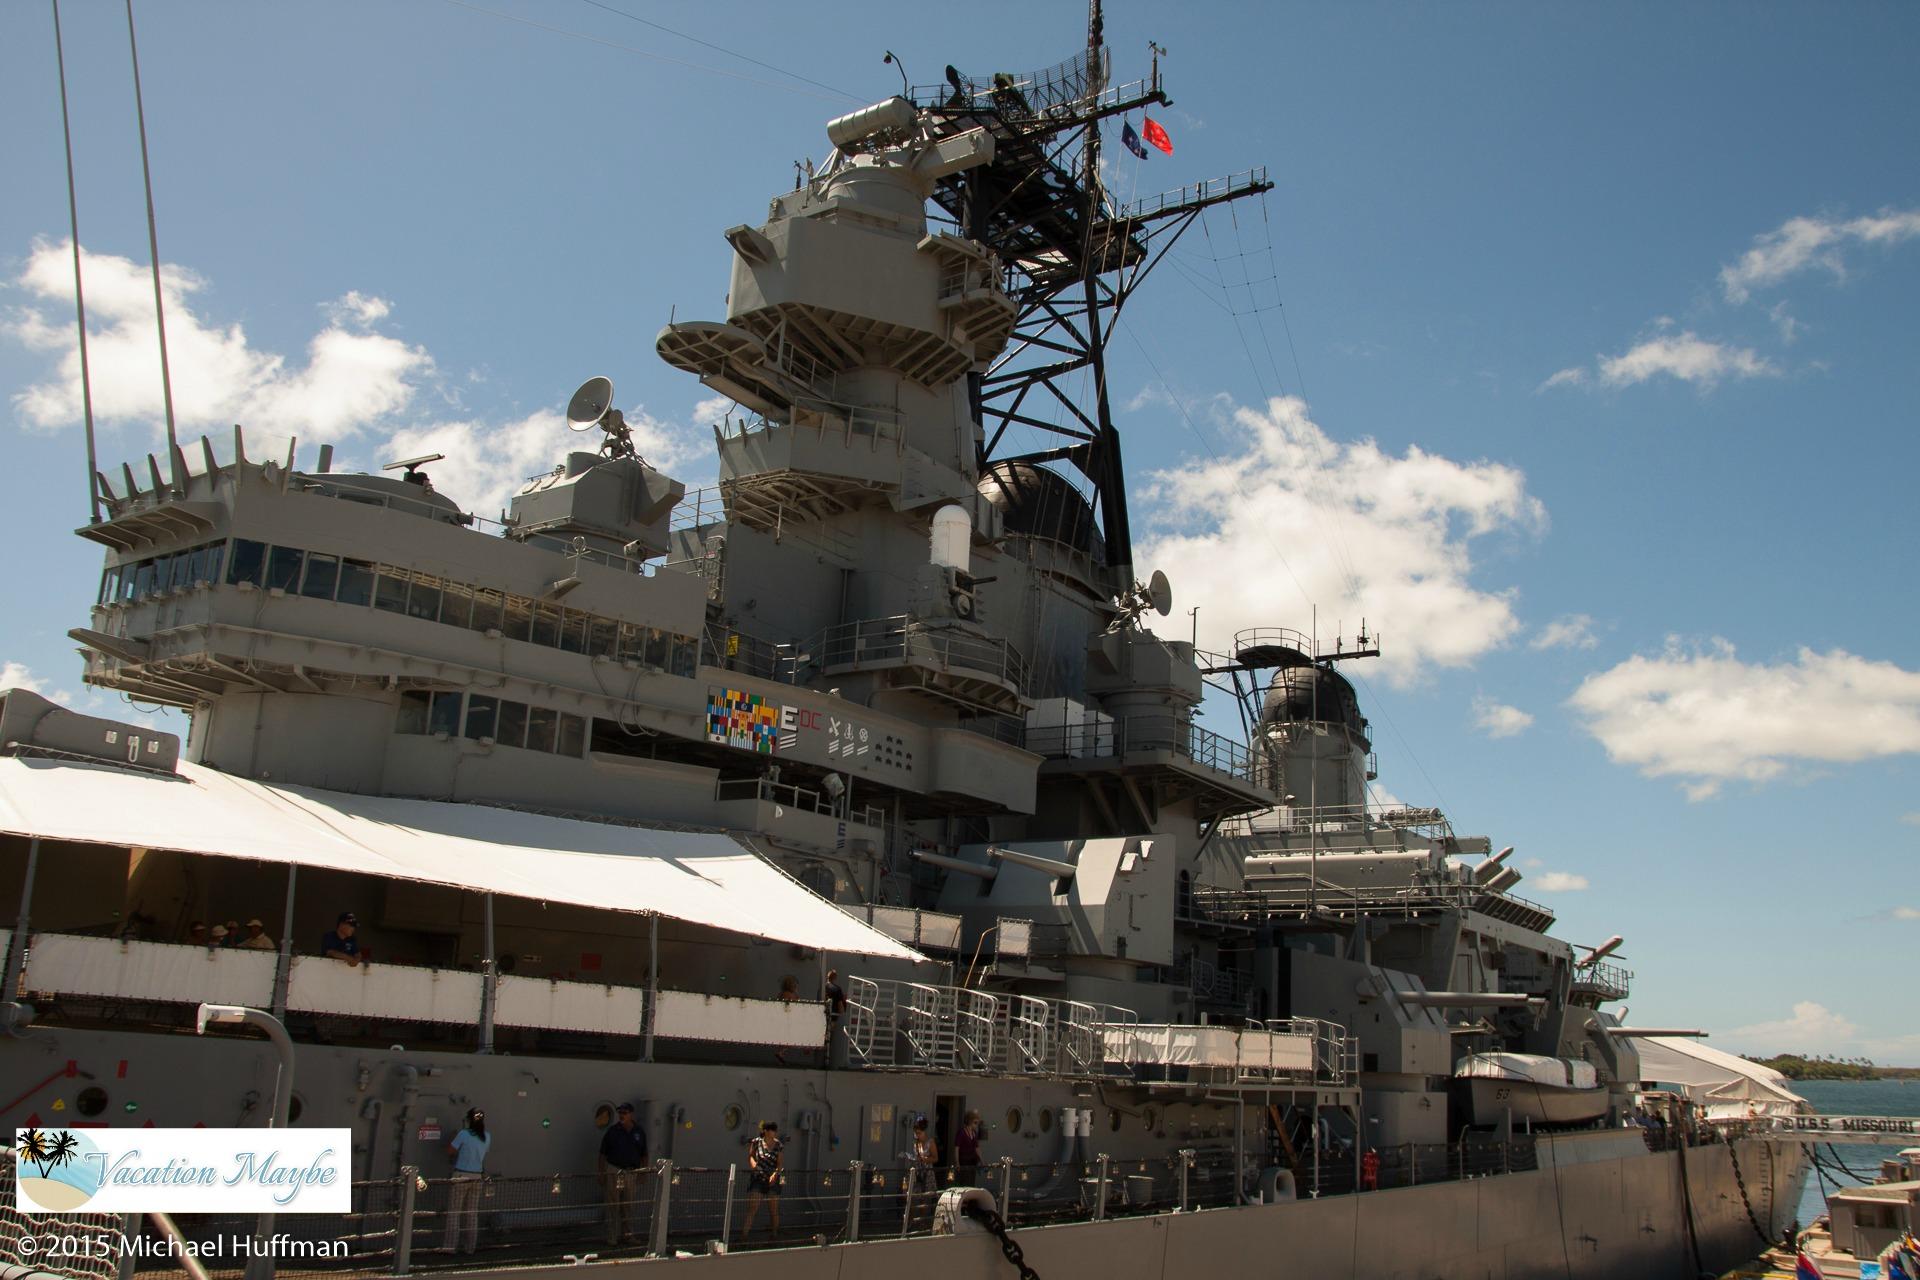 Pearl Harbor Tours >> Battleship USS Missouri Memorial - vacationmaybe.com